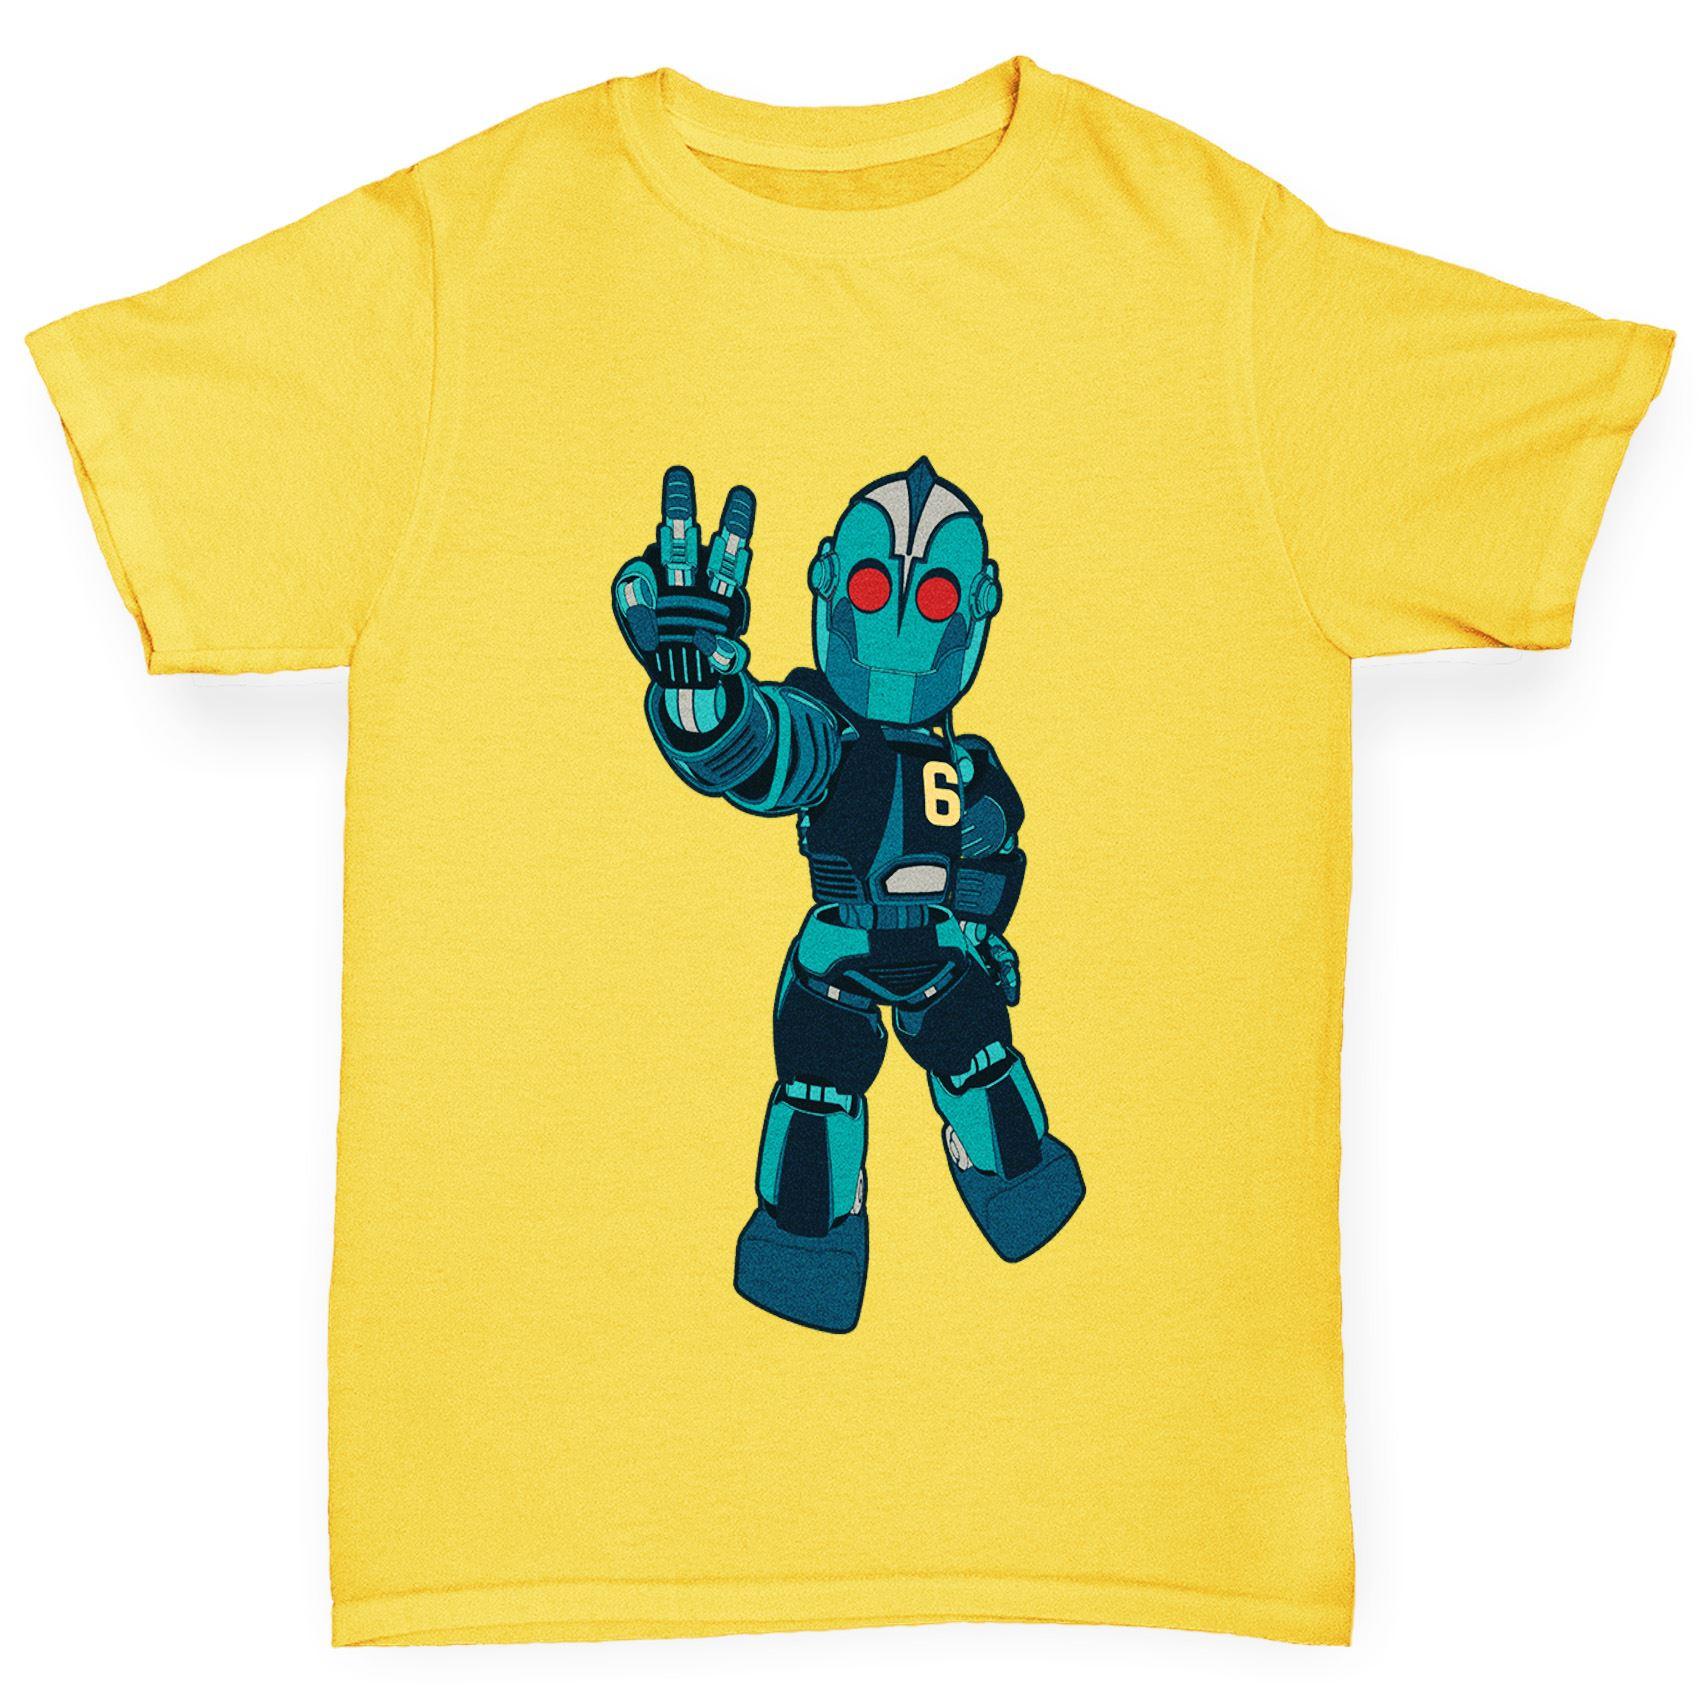 Twisted Envy Boy/'s Robot Love Cotton T-Shirt